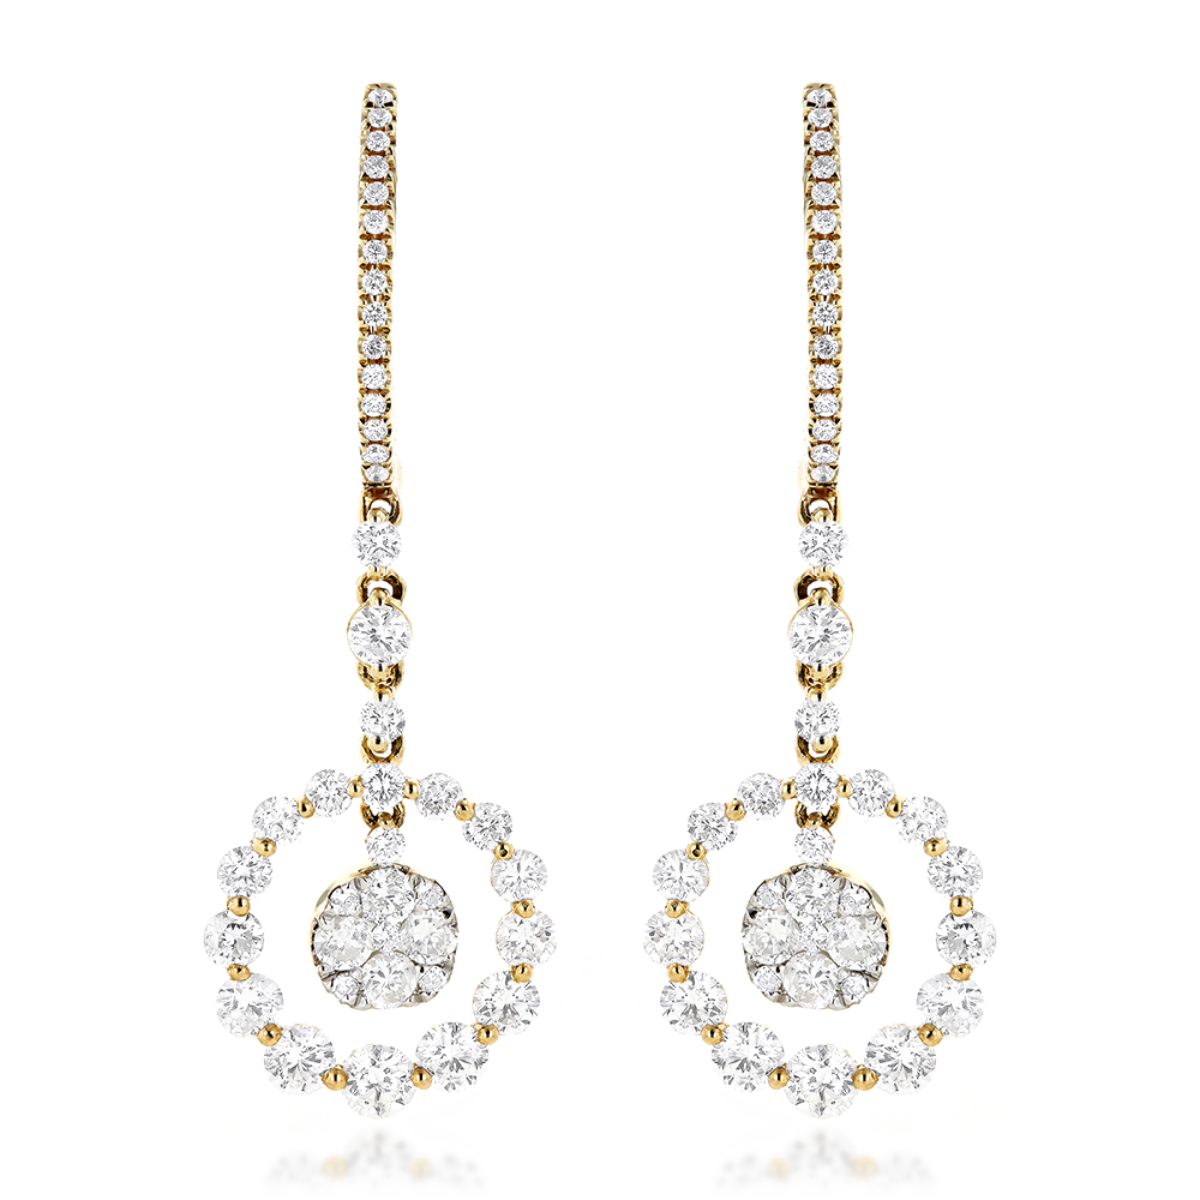 Ladies Round Diamond Drop Earrings 2.4ct 14k Gold